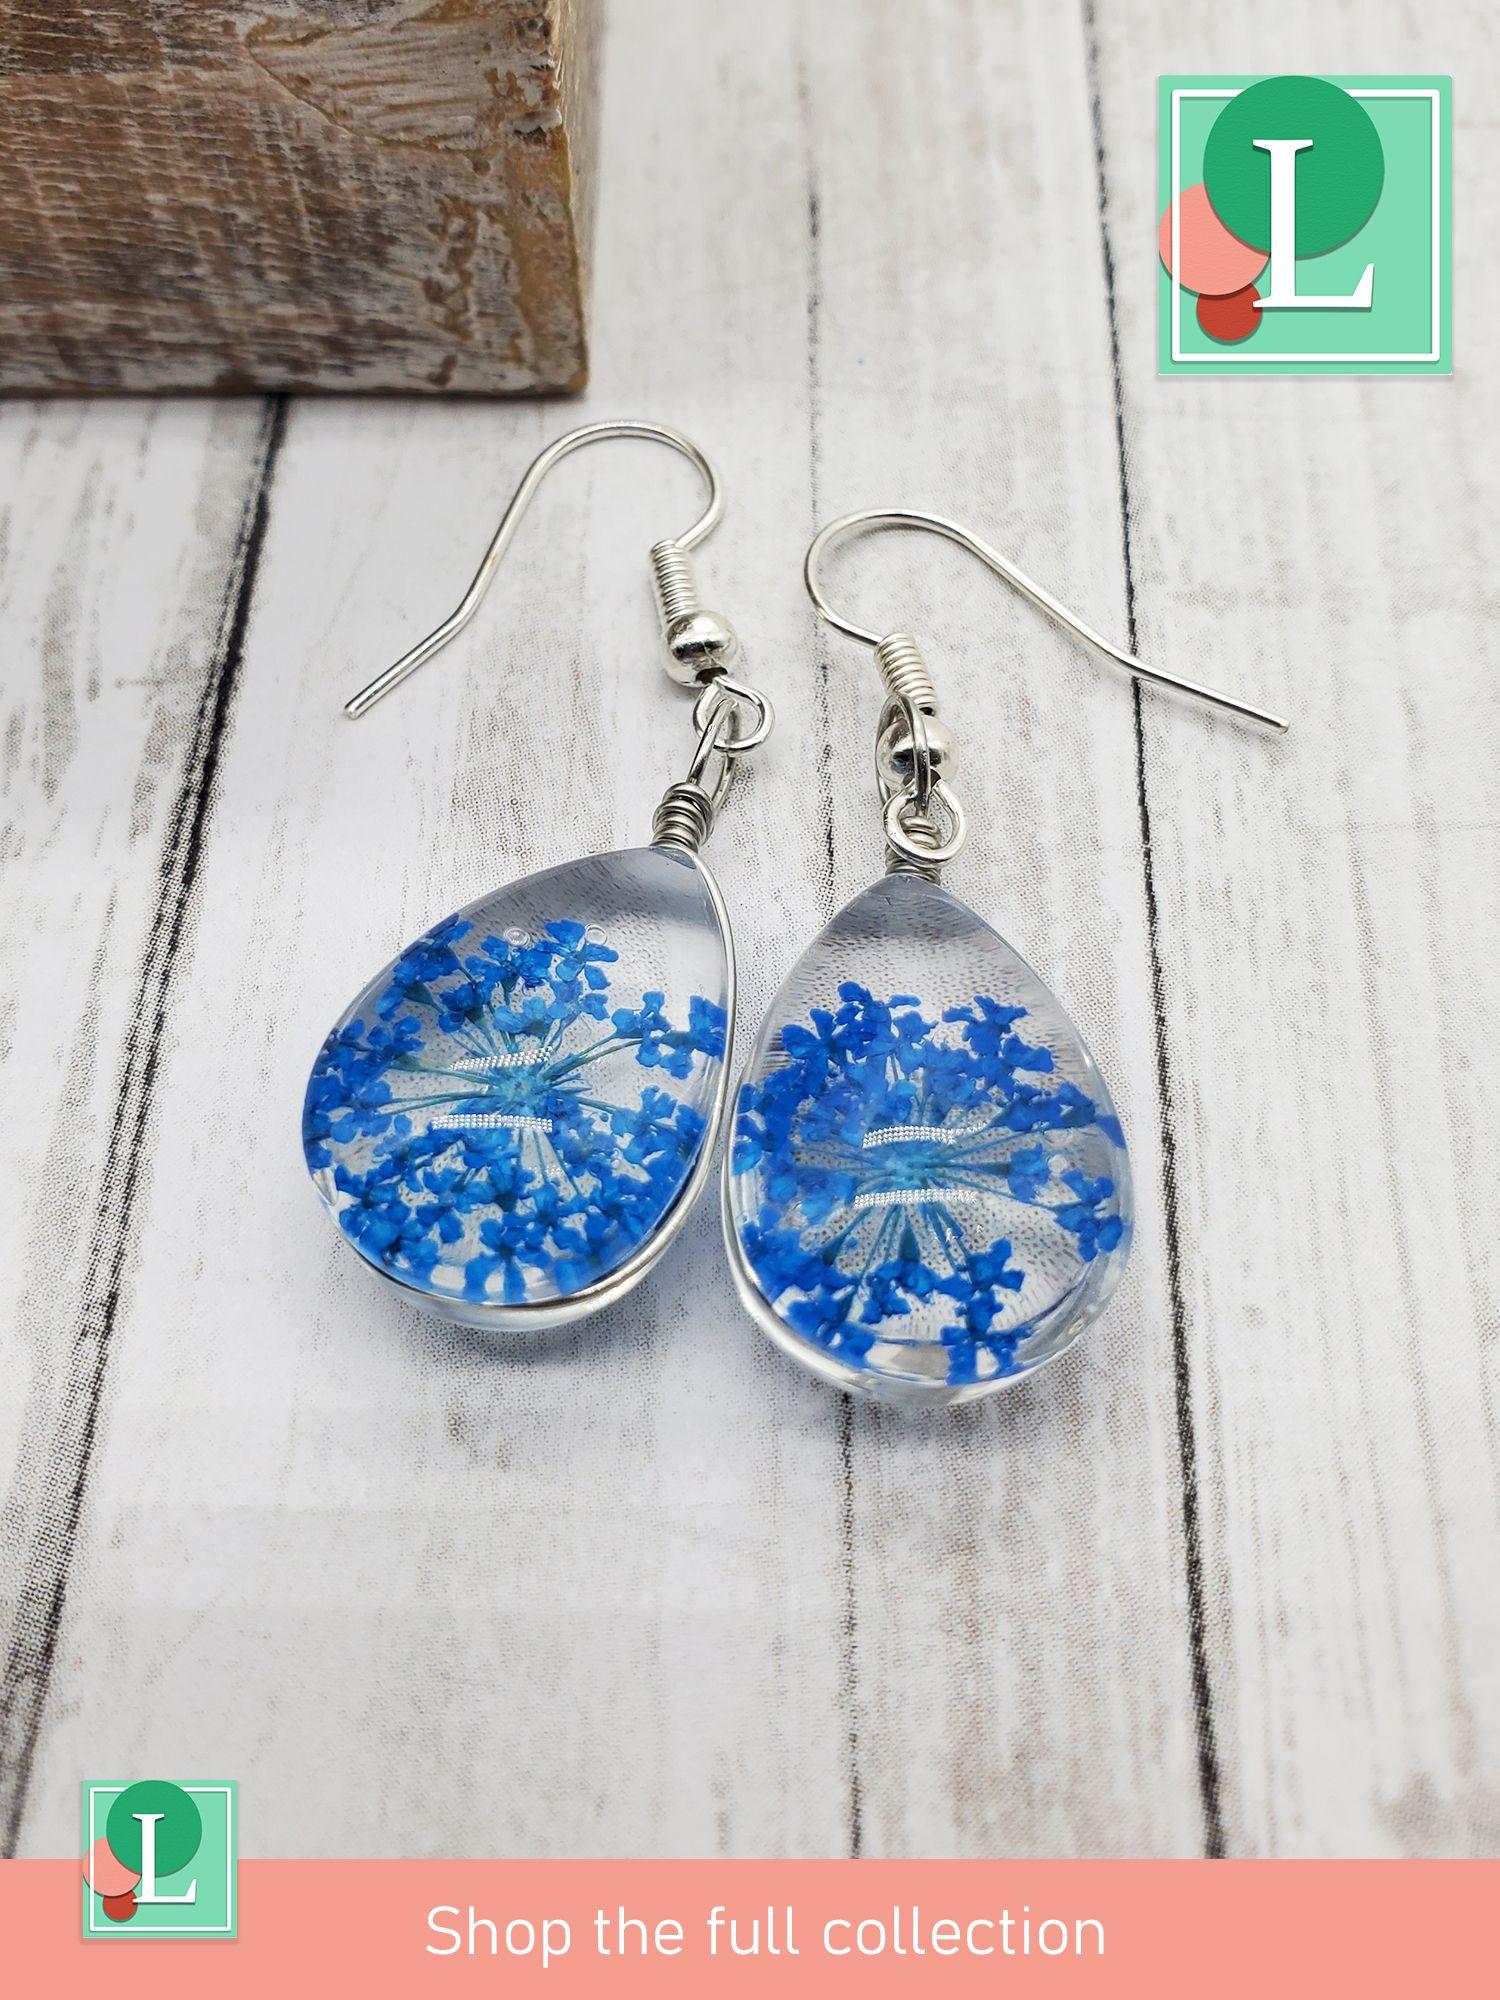 silver earrings floral jewellery floral earrings Earrings dried flower earrings jewelry